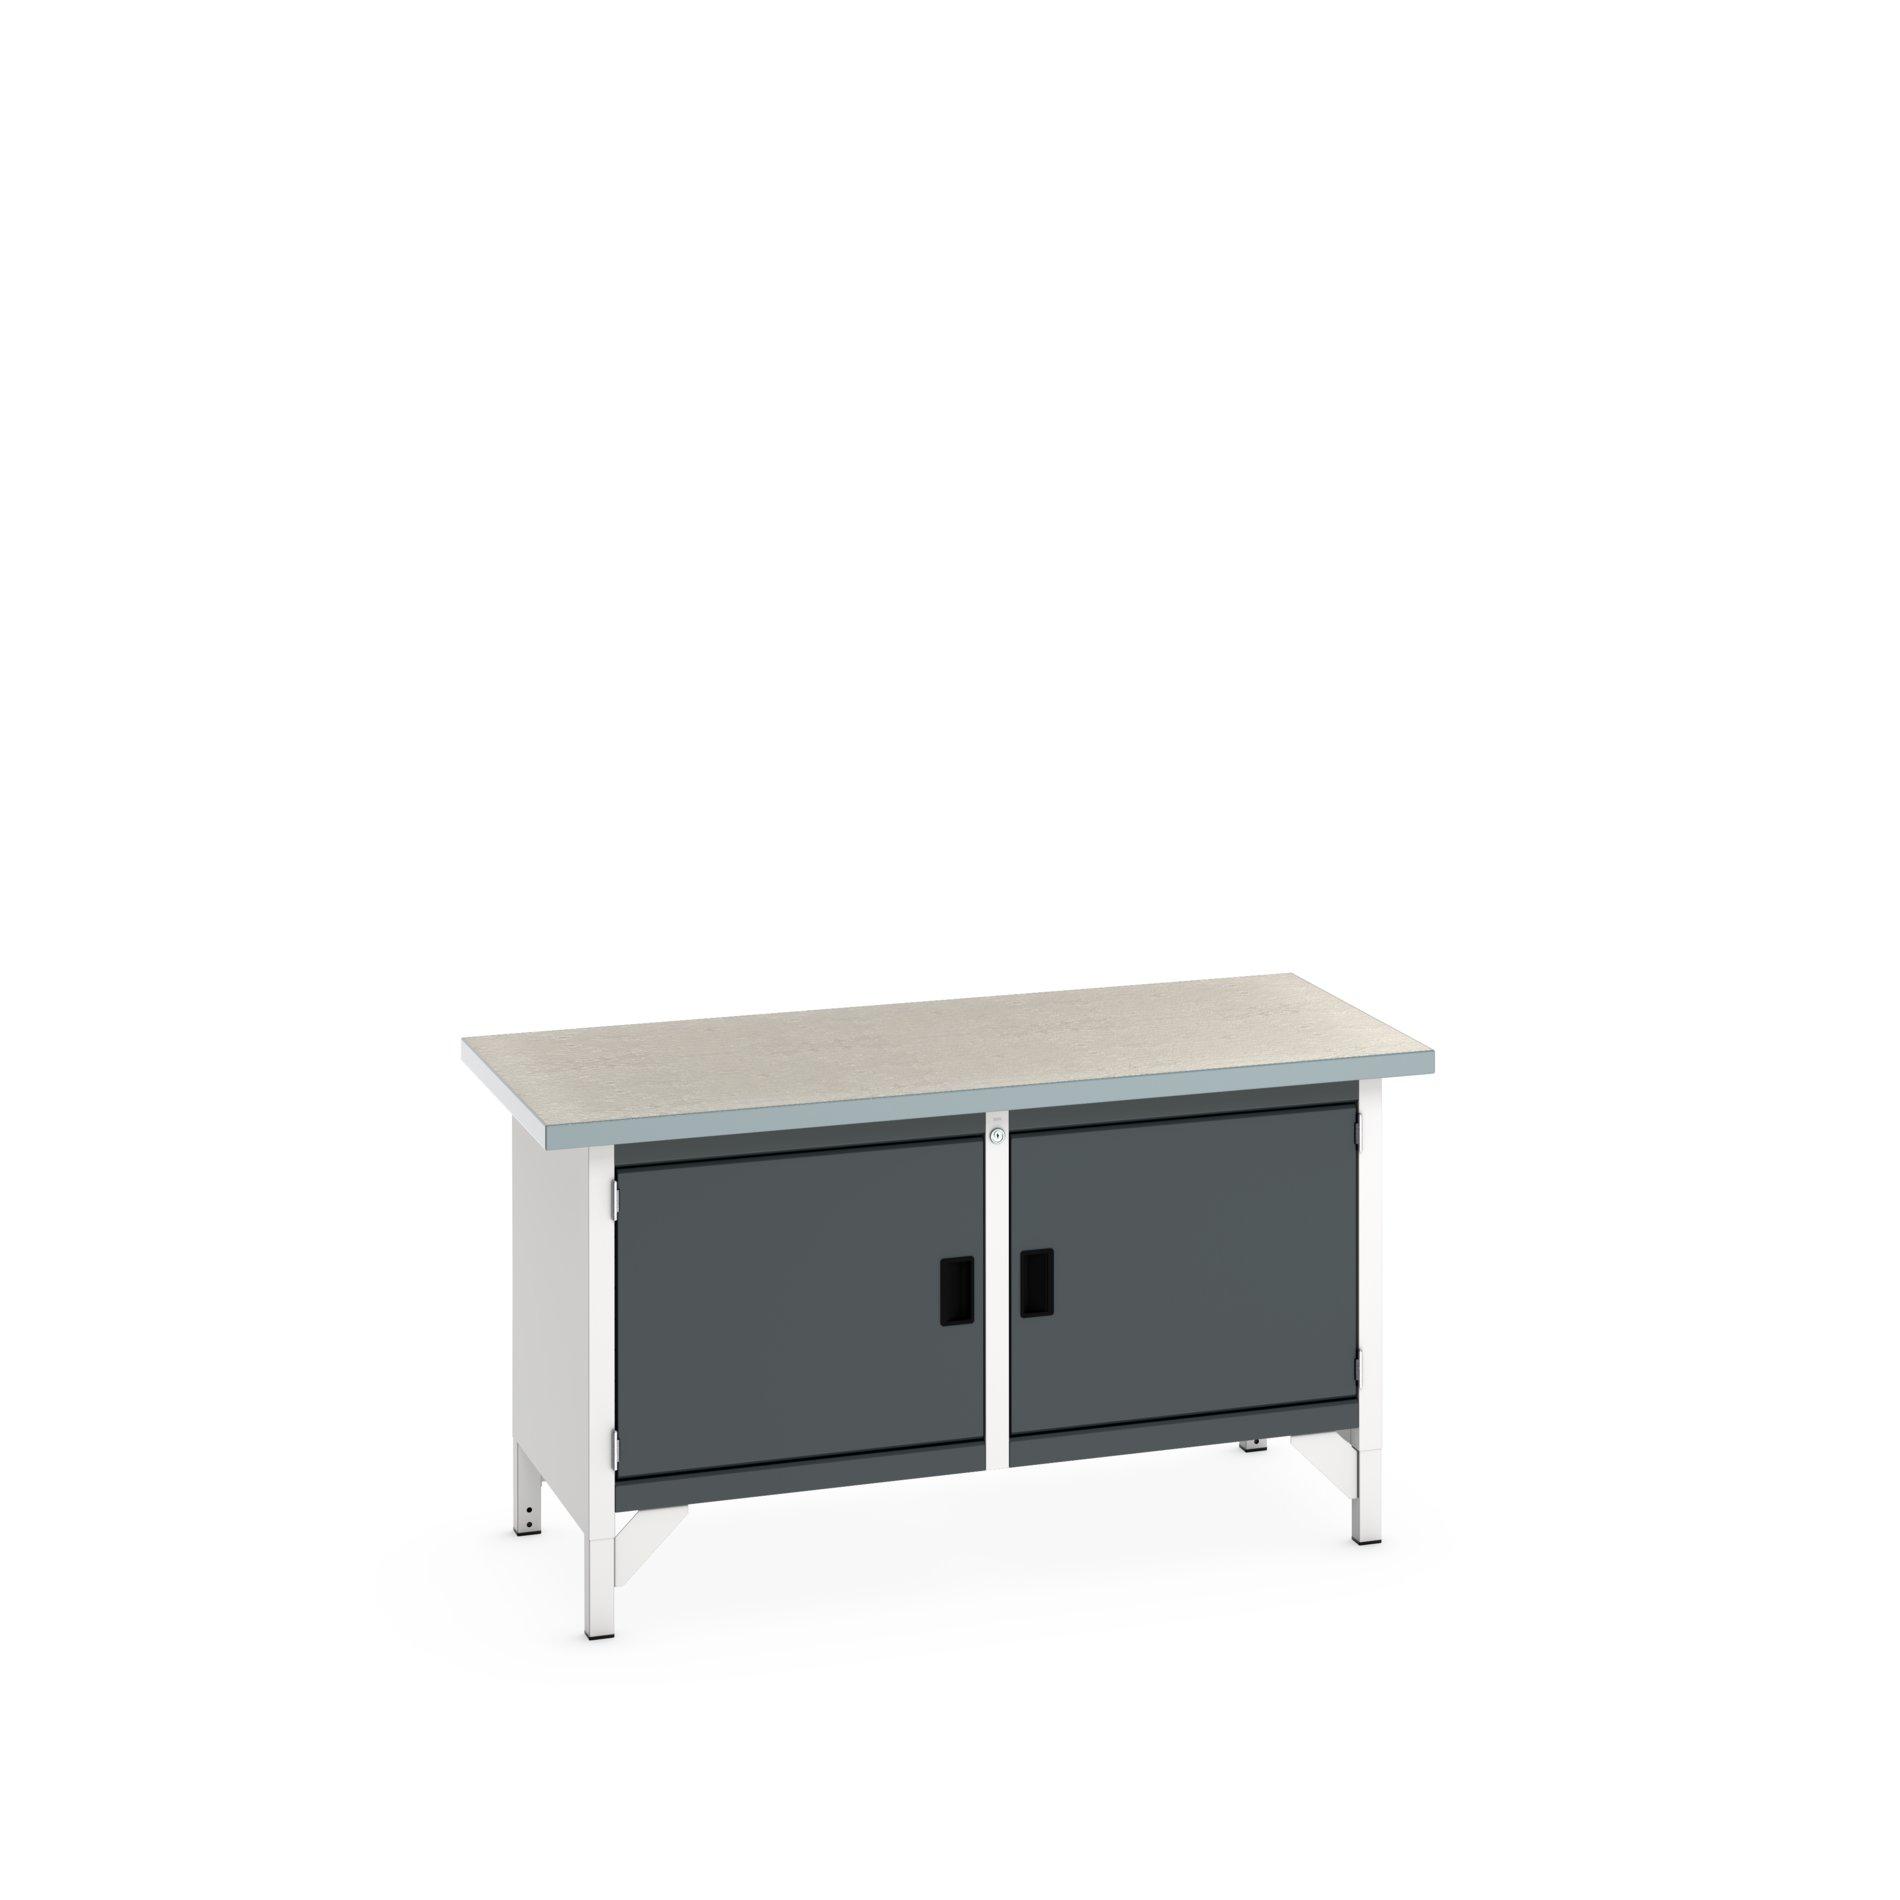 Bott Cubio Storage Bench With Full Cupboard / Full Cupboard